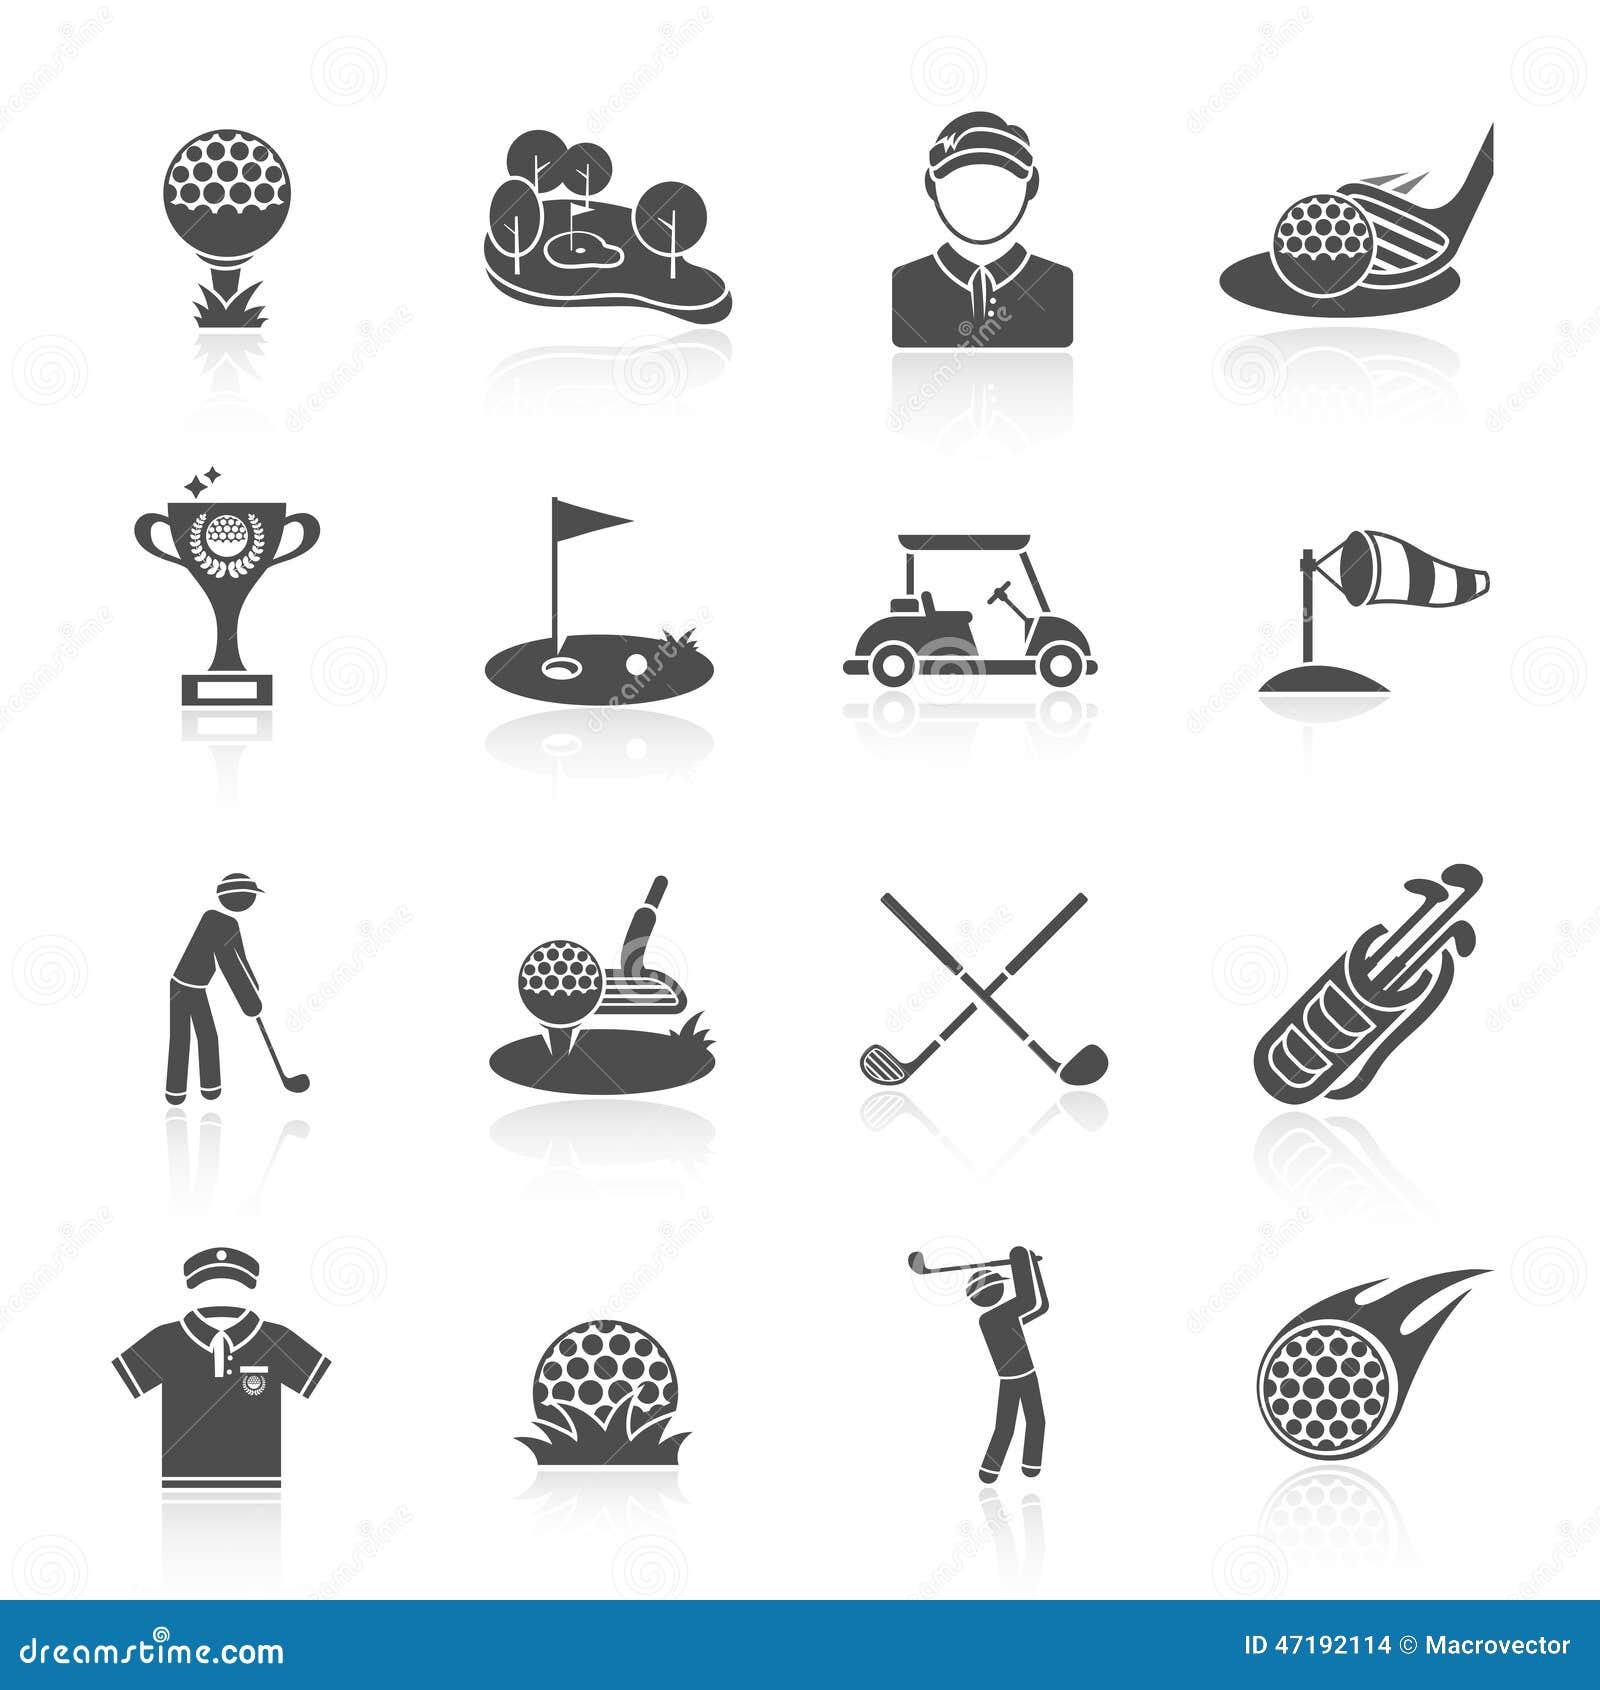 golf icons set black stock vector  illustration of ball